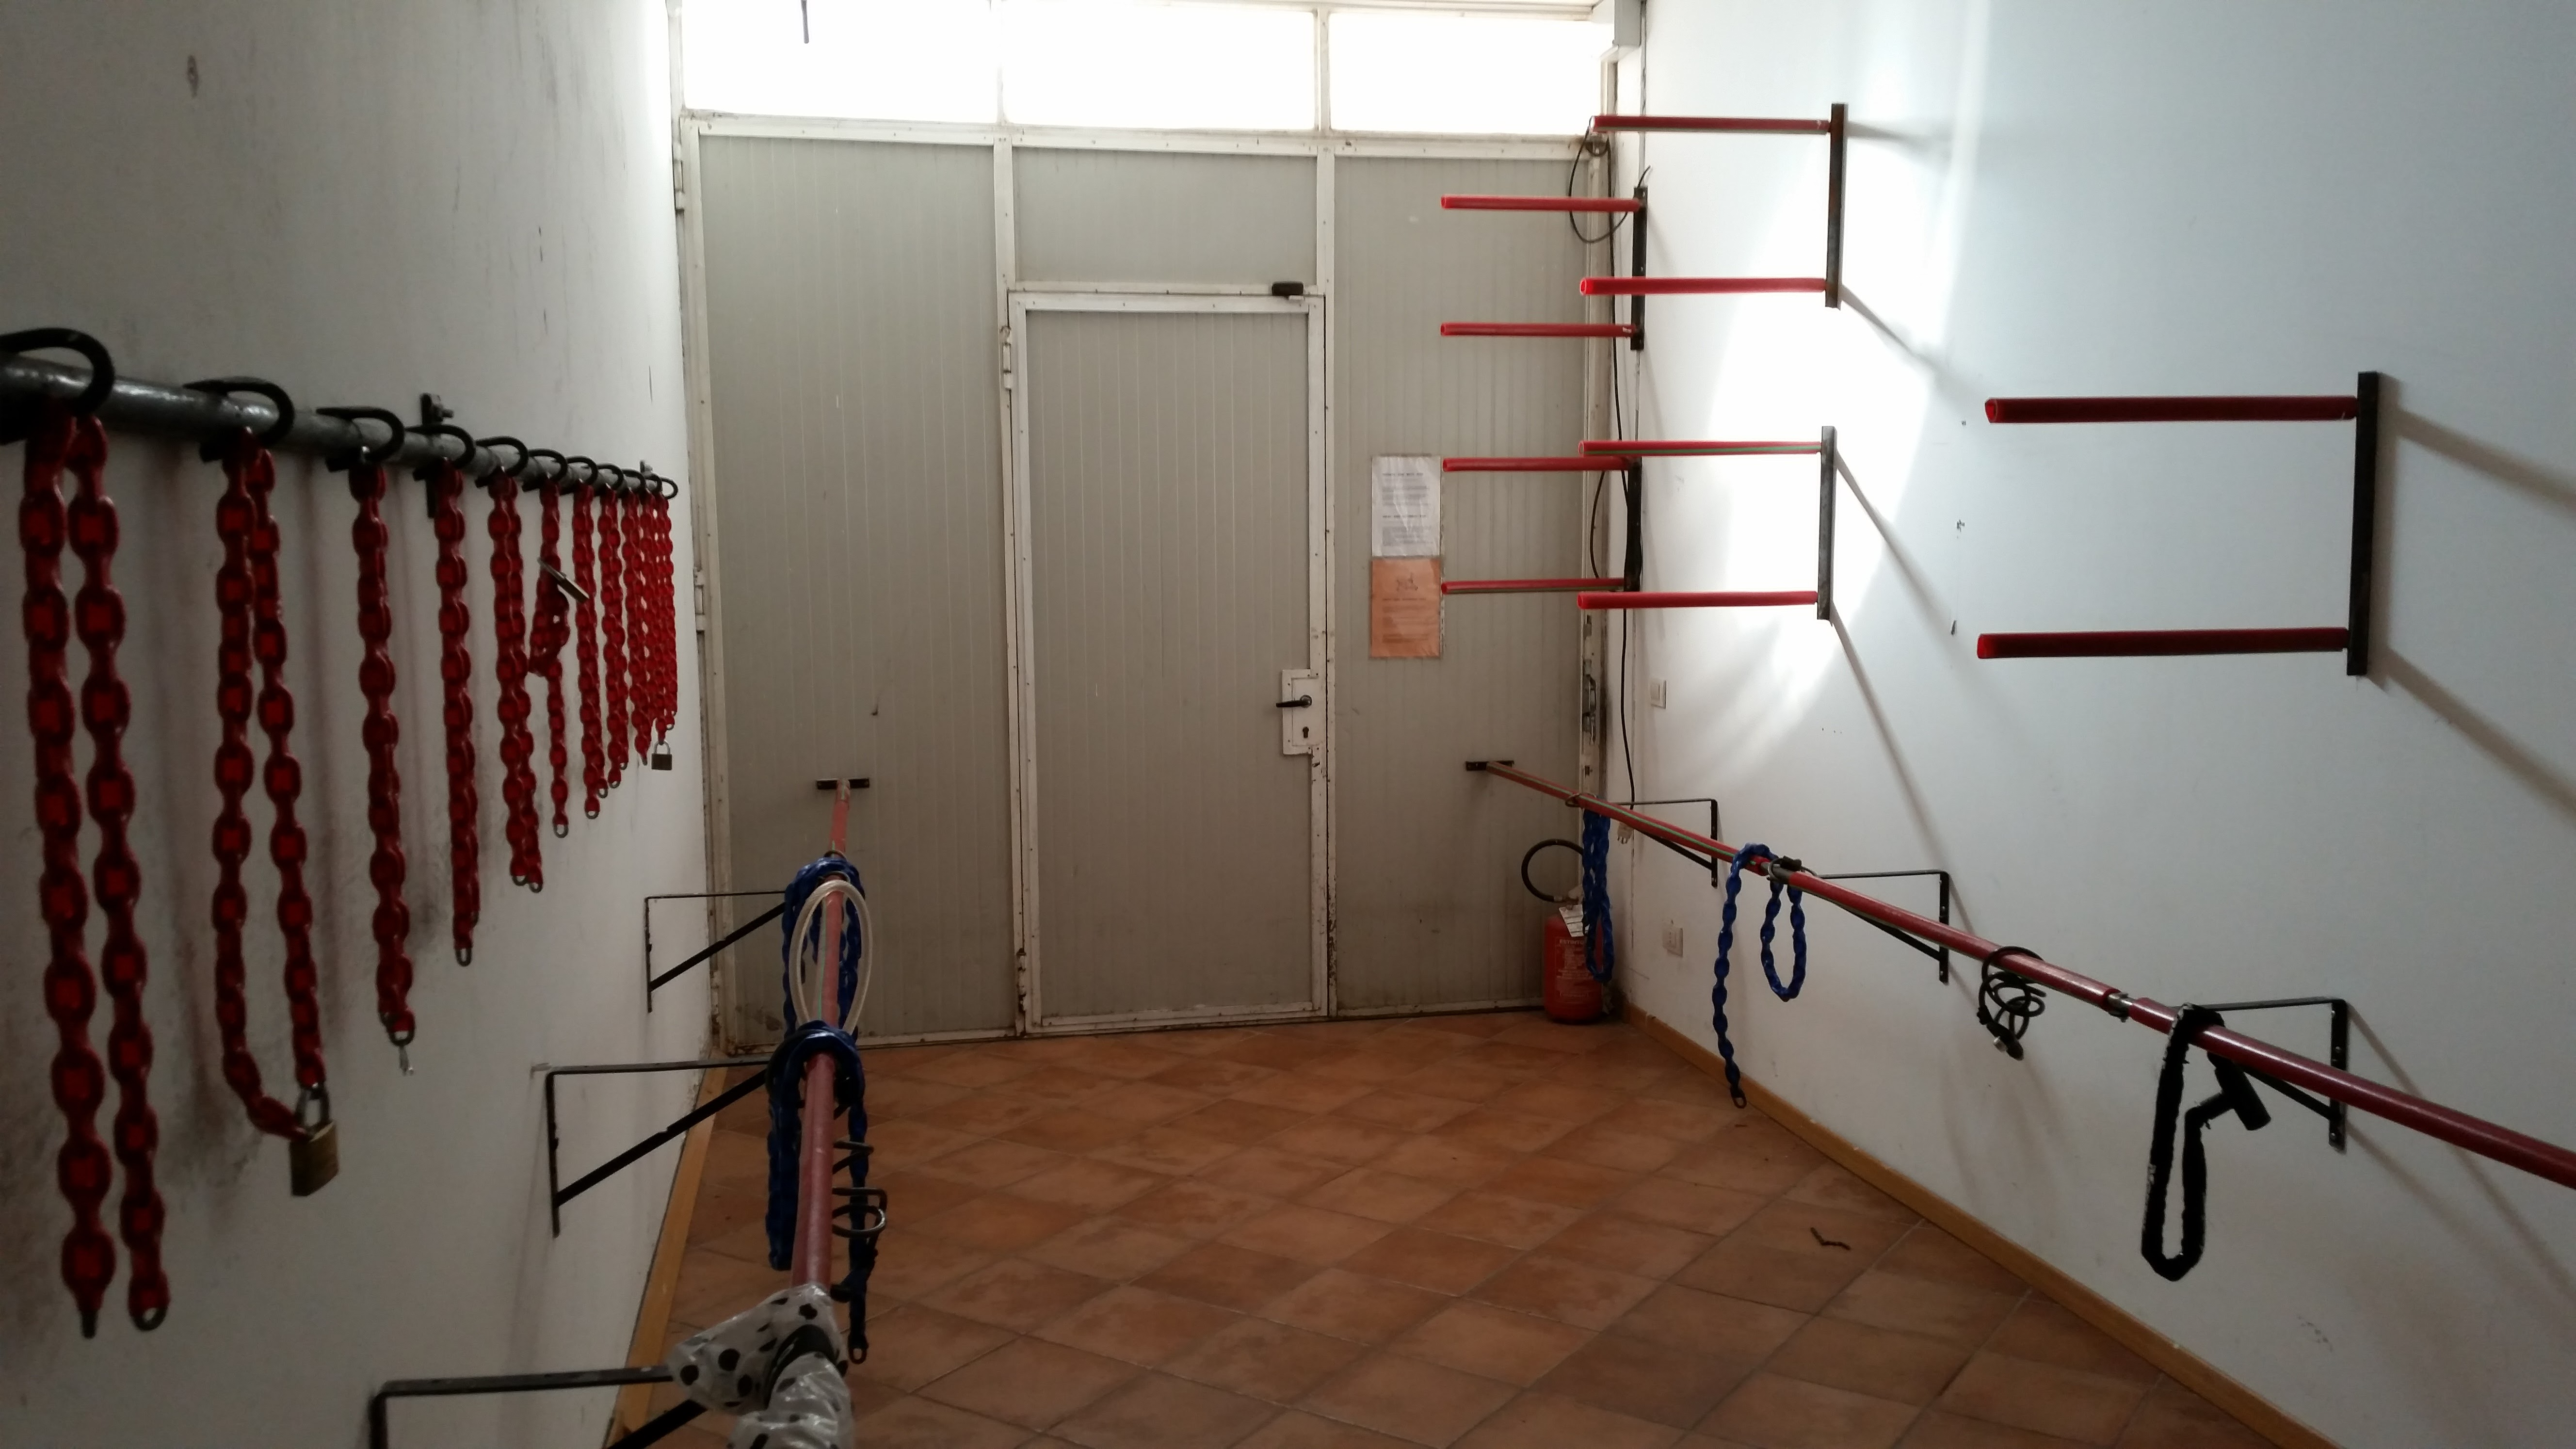 Deposito - Storage